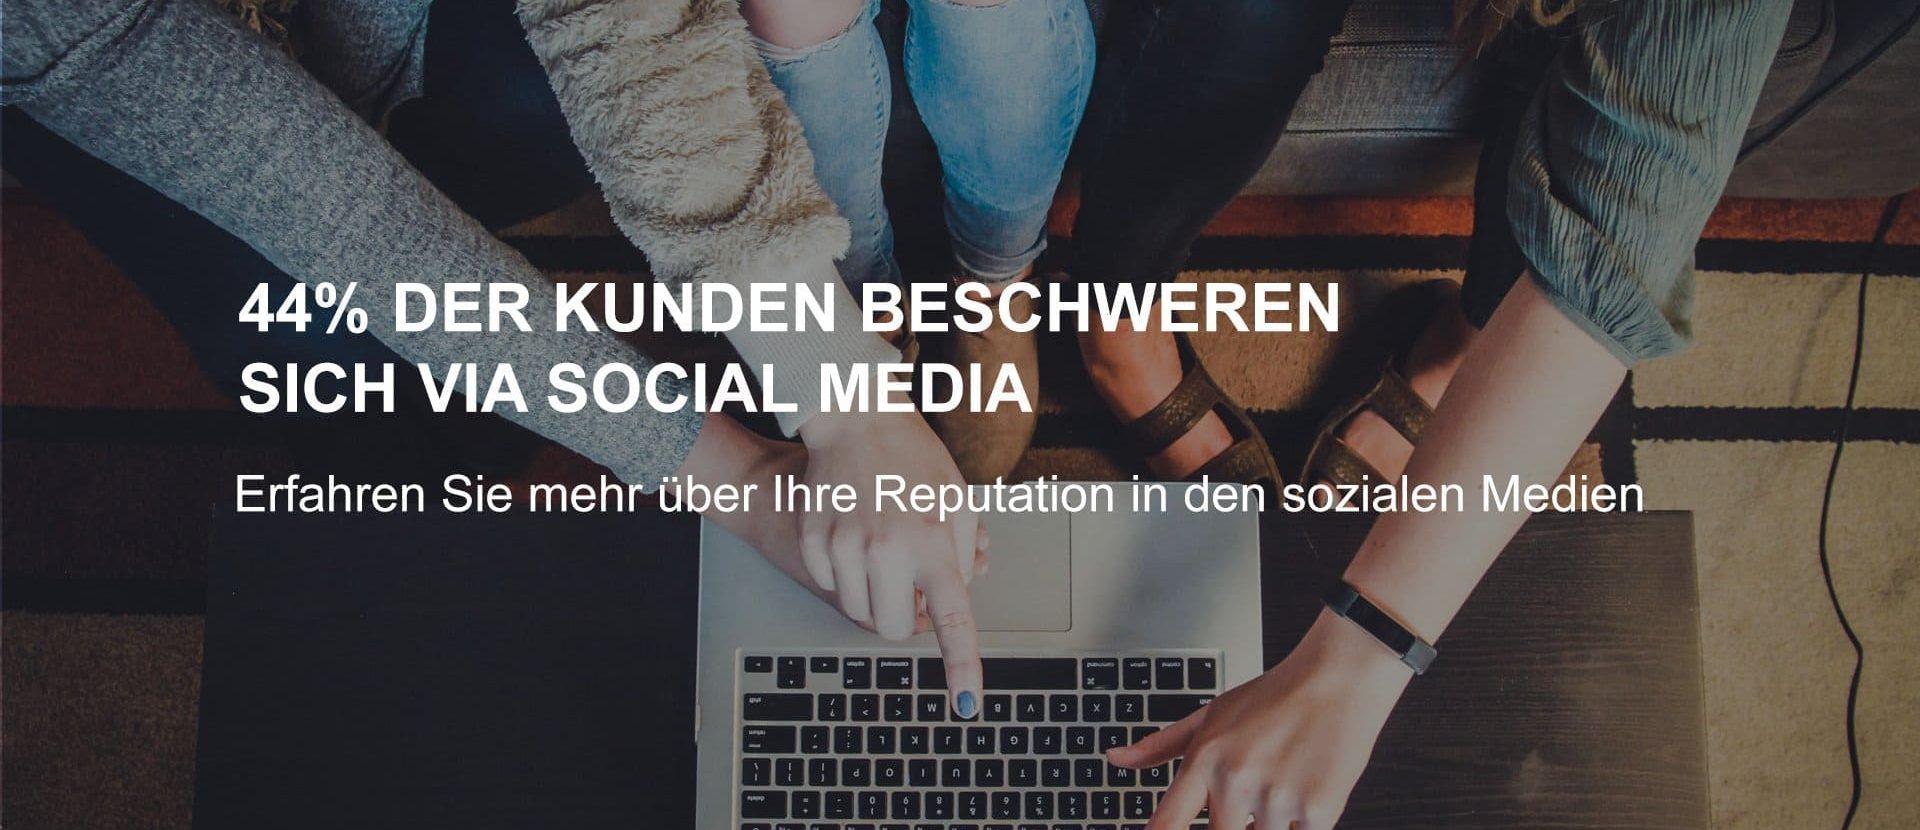 Kundenbeschwerde via Social Media